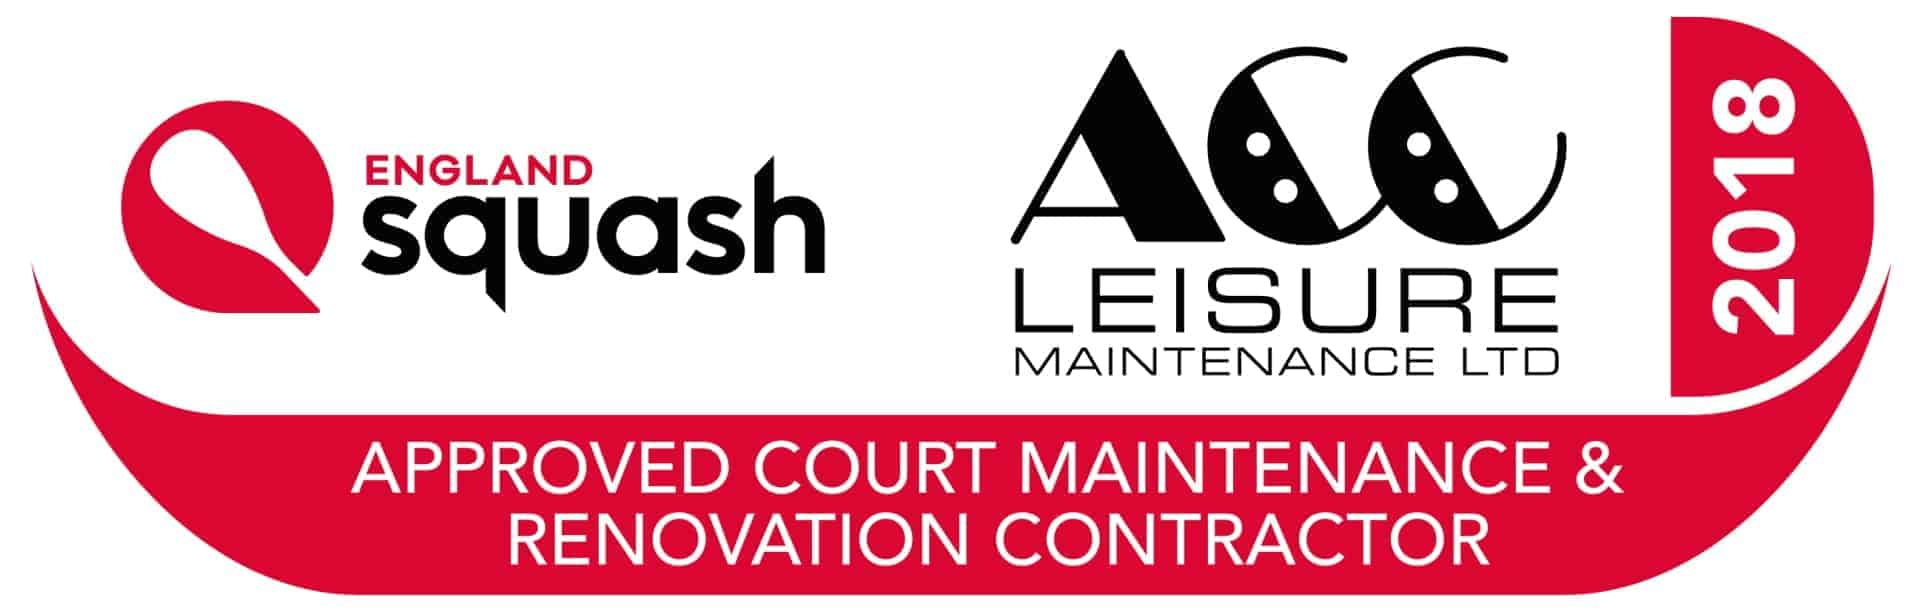 ACC Leisure banner header - English Squash 2018 compressed